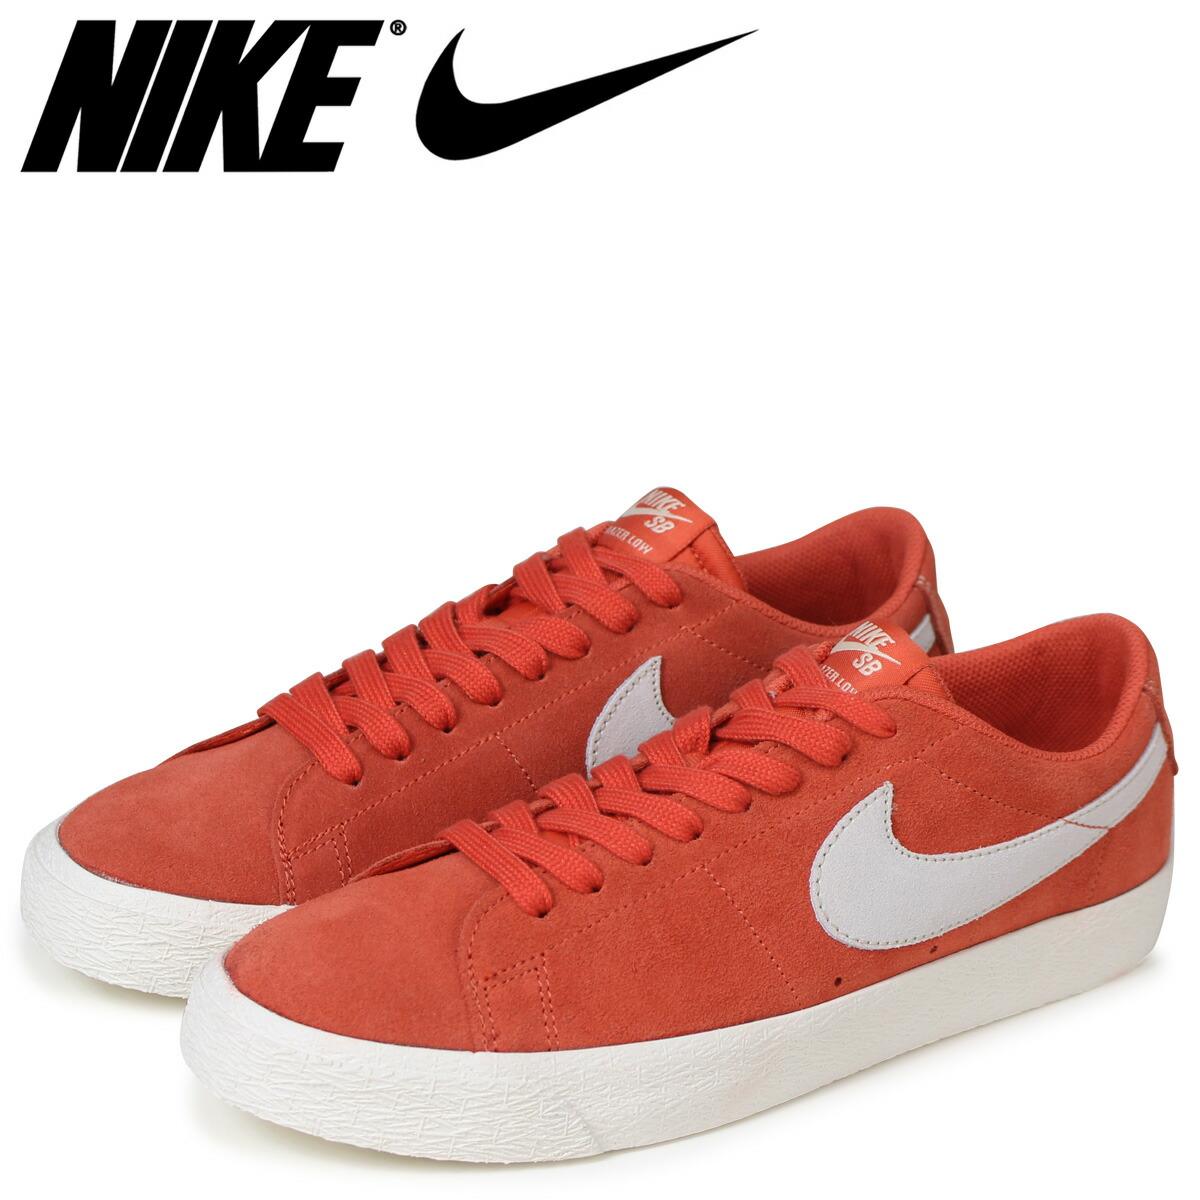 Nike Blazer Baja Carro Rojo Vendimia Prima gTRUyWslyO